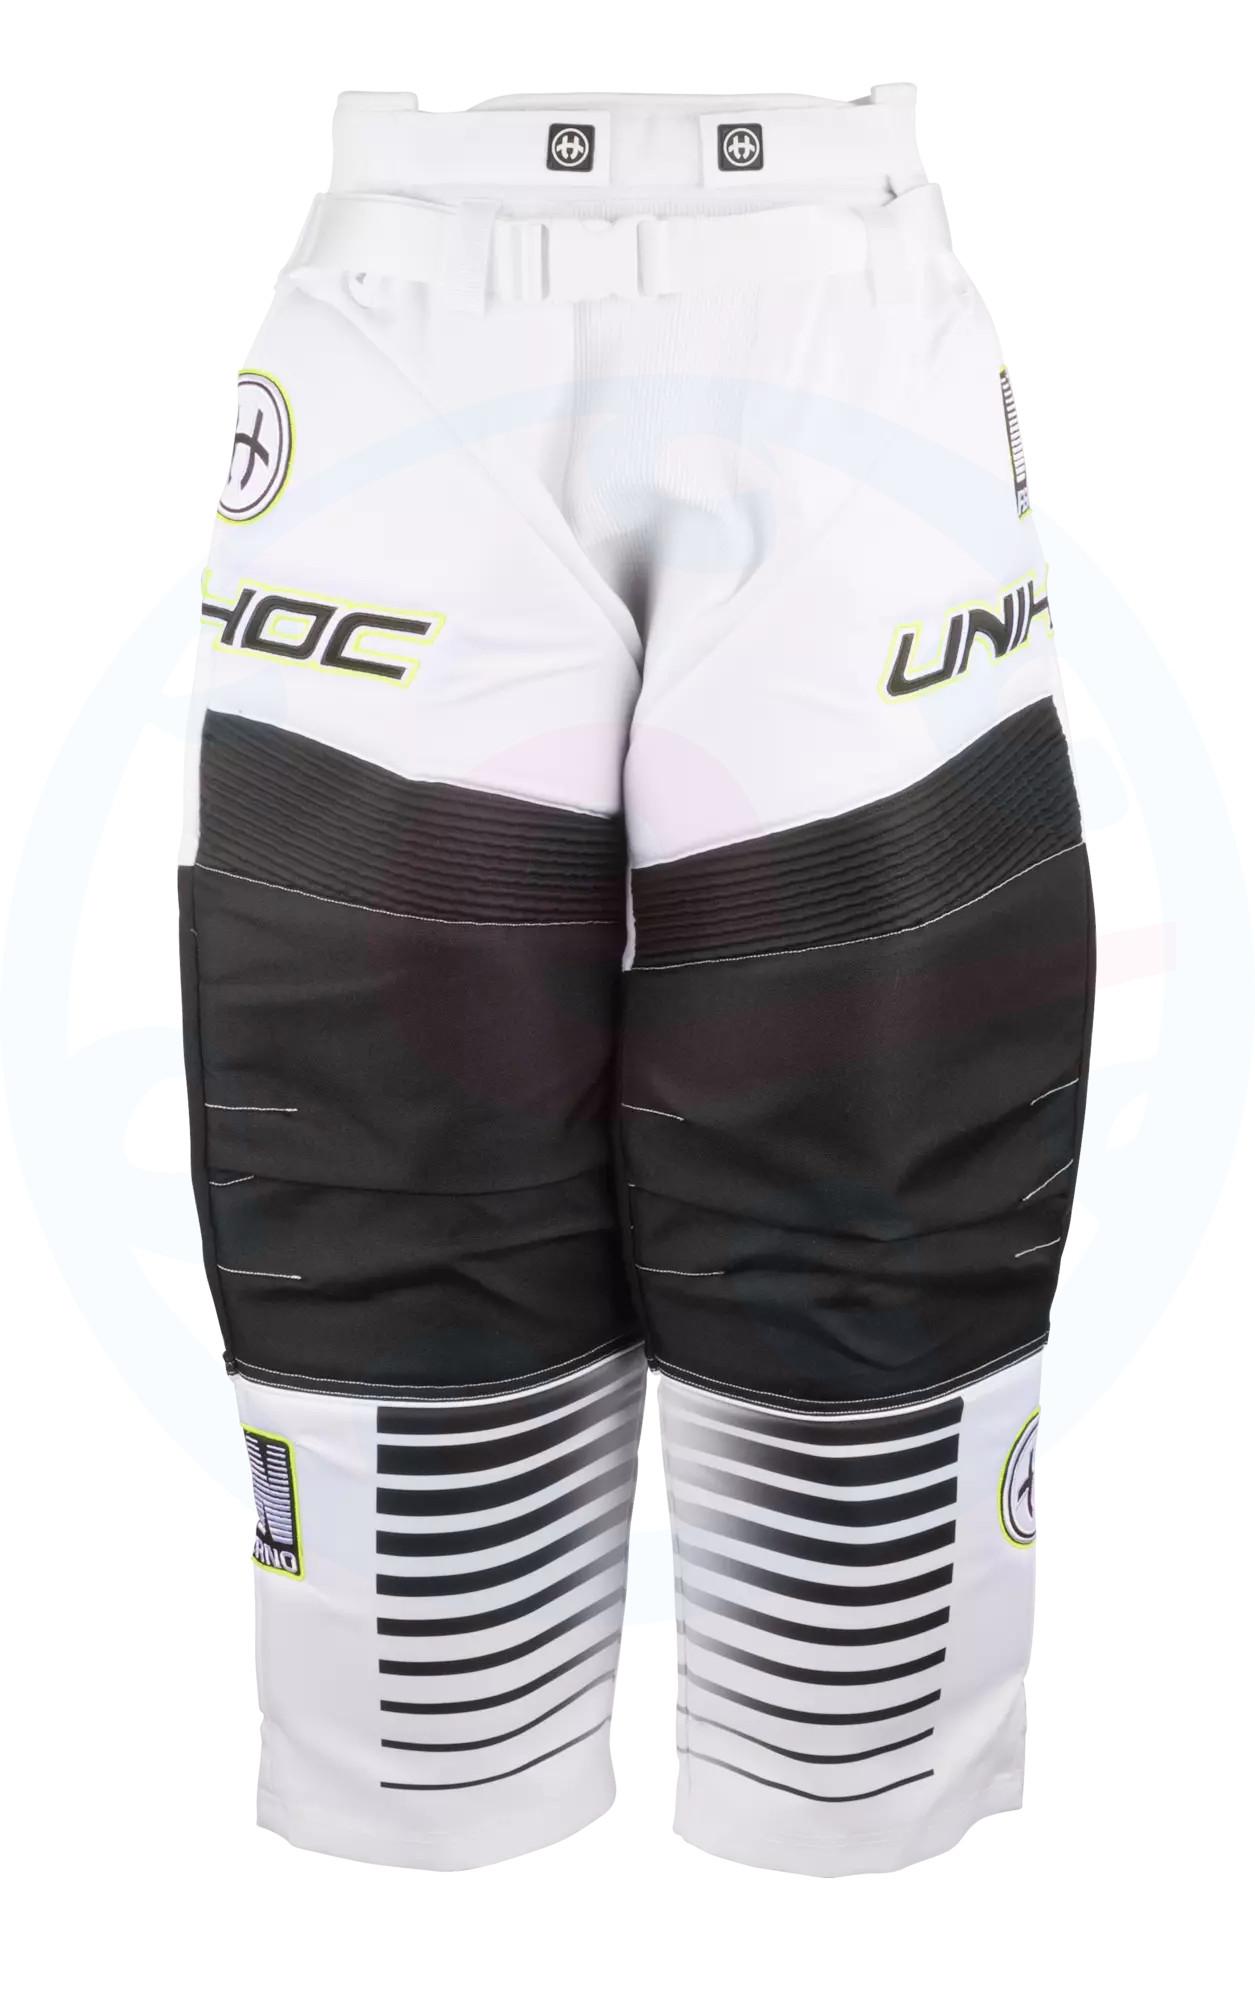 0ce0d6122a9 Unihoc INFERNO white black Goalie pants